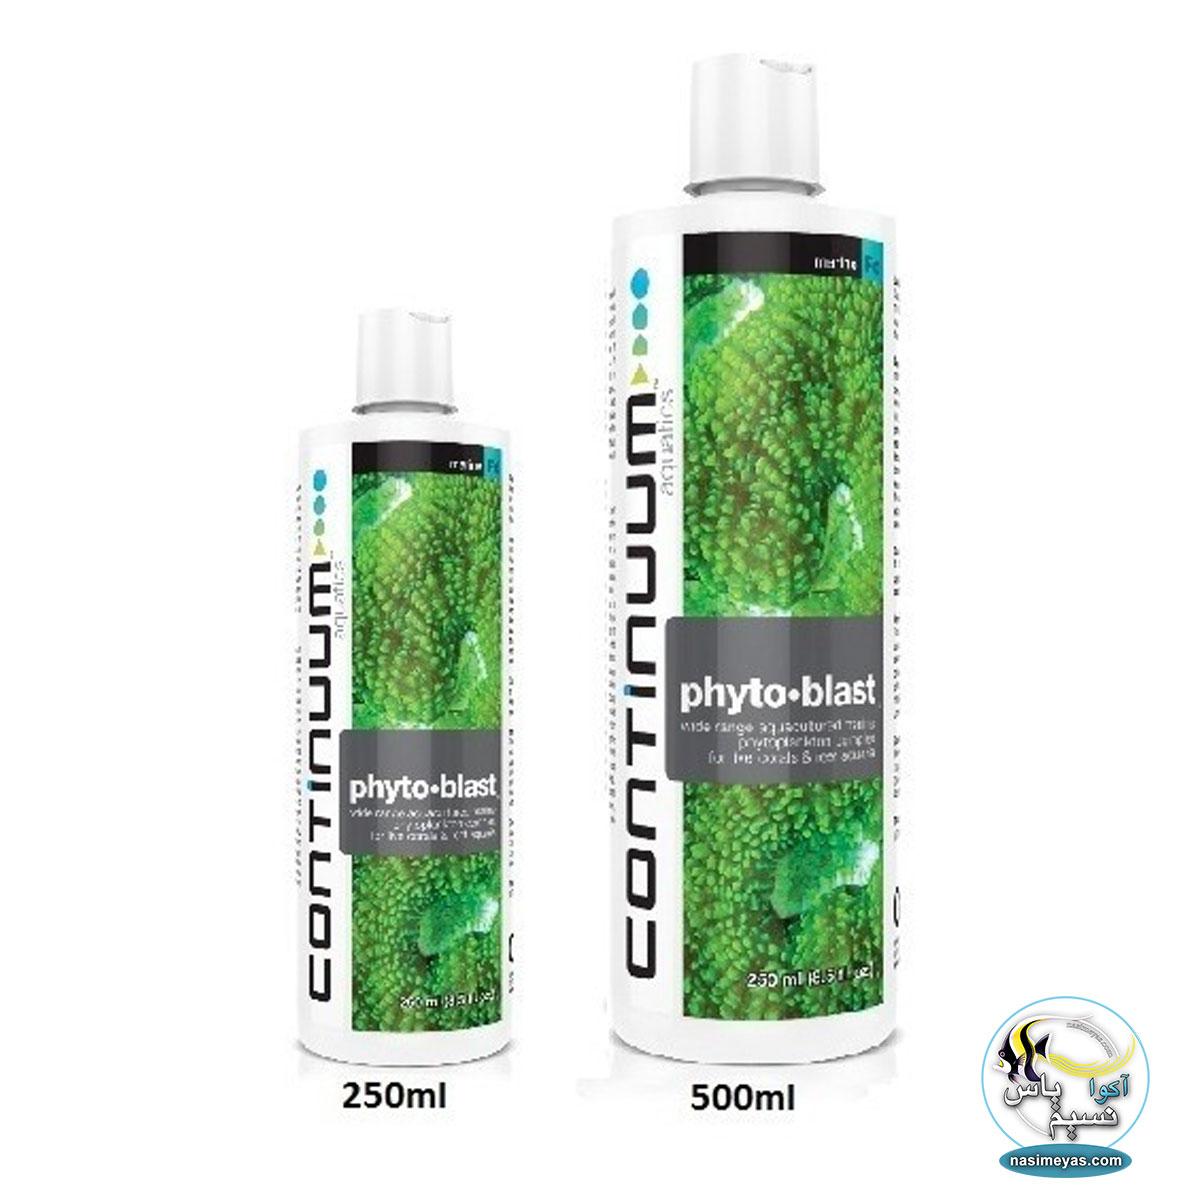 Continuum aquatics Phyto.blast